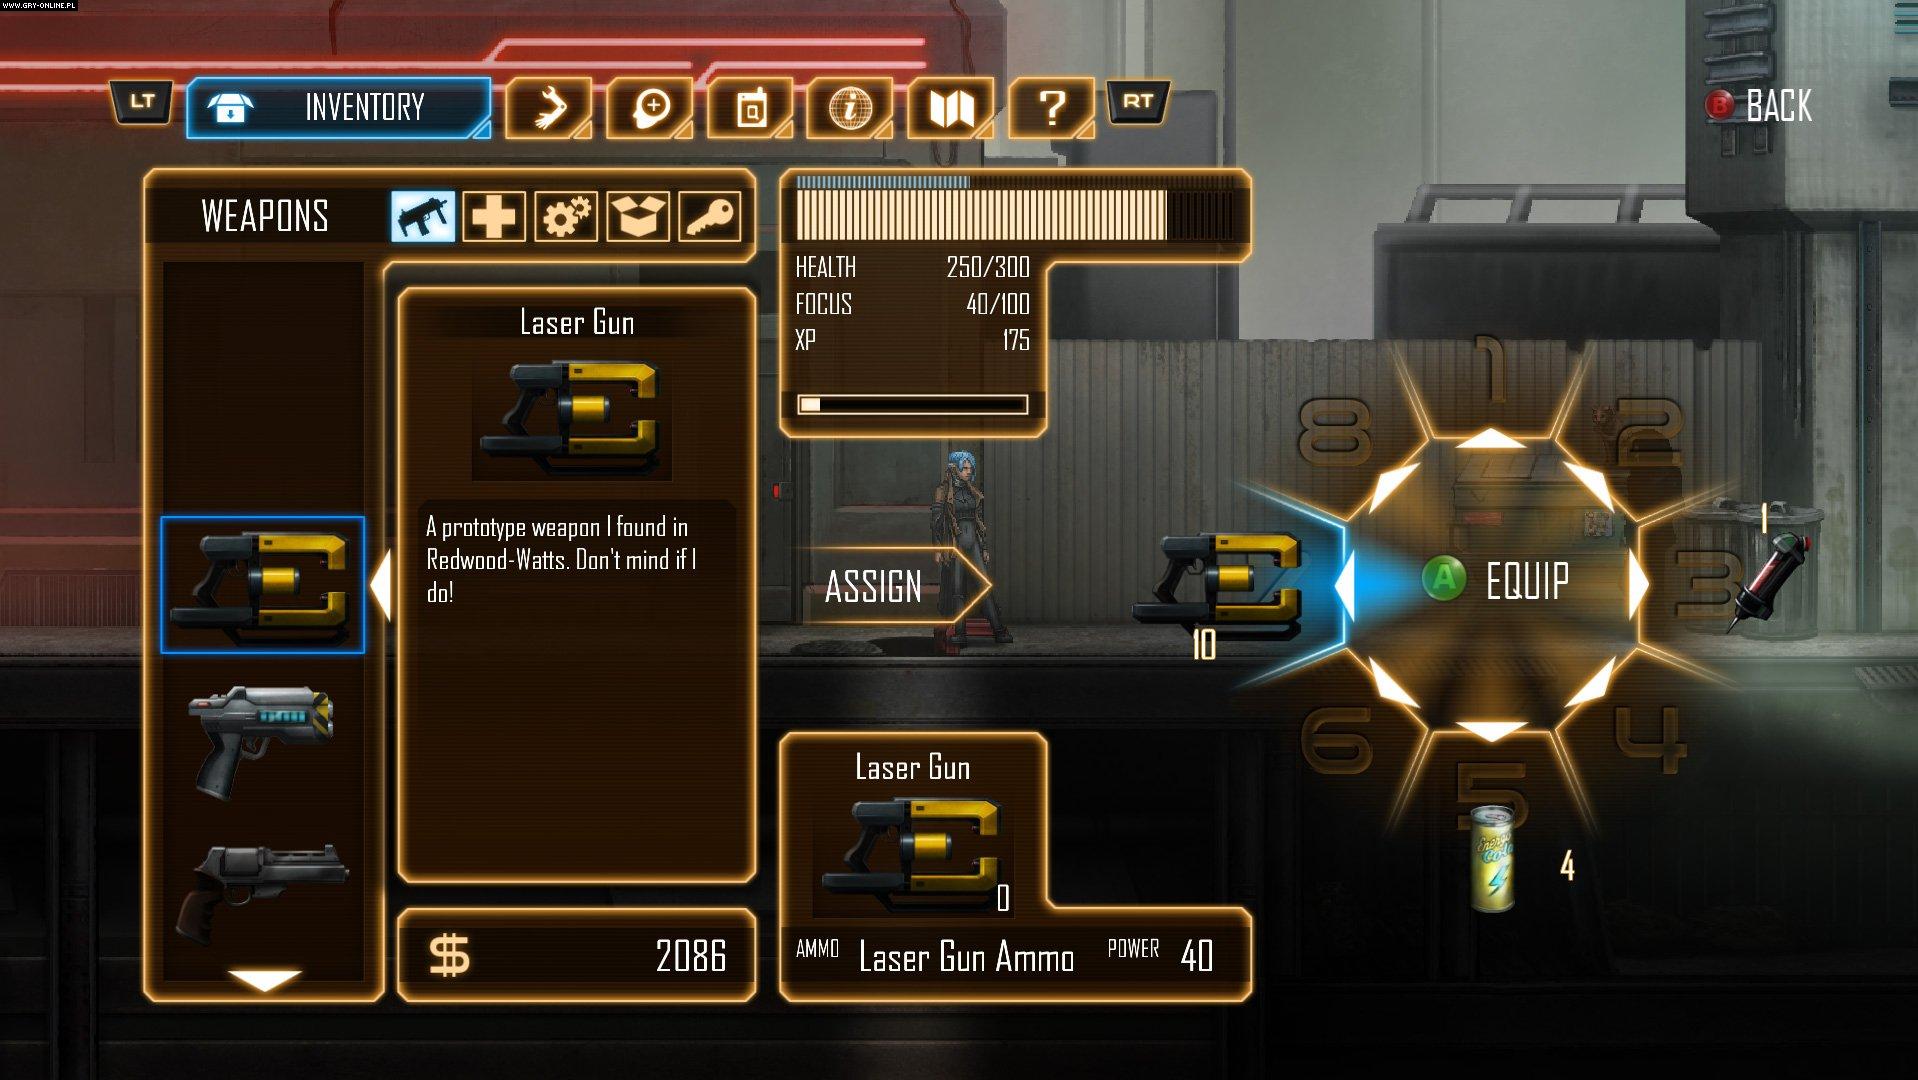 Ps4 Games Science Fiction : Dex screenshots gallery screenshot gamepressure